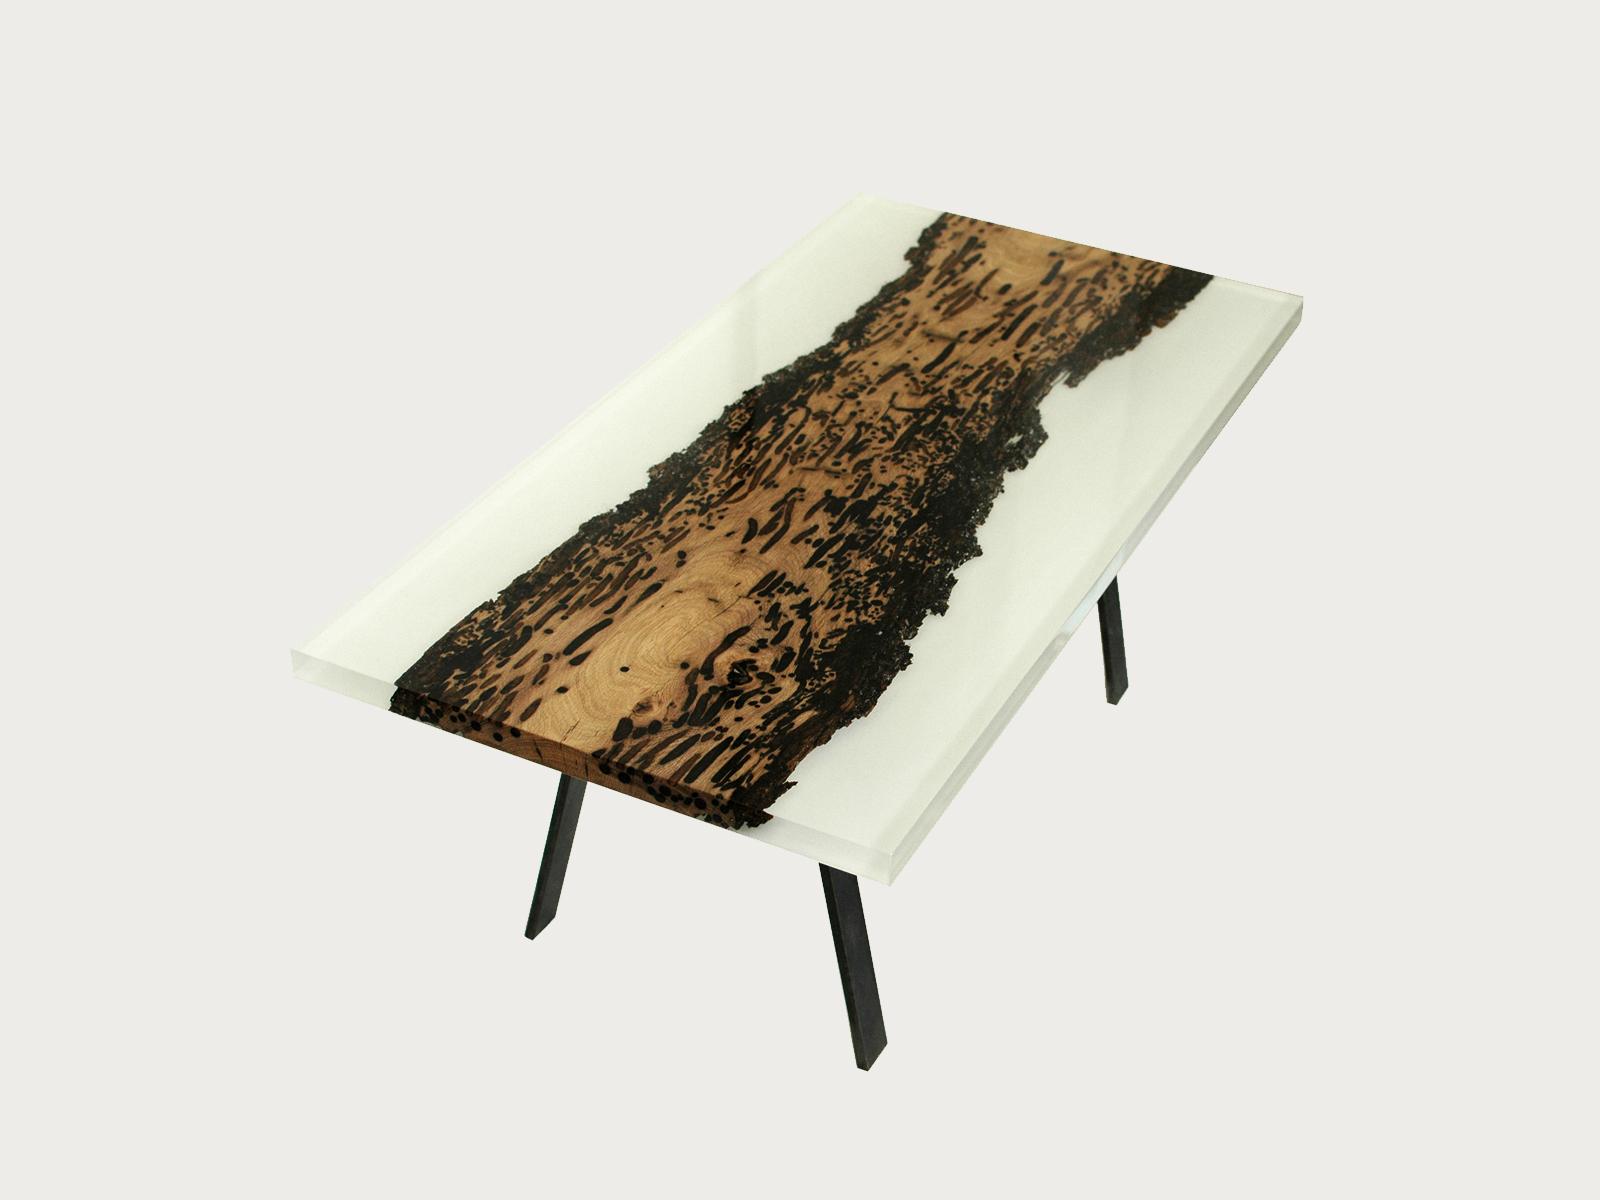 alcarol-foggy-coffee-table-bricola-1